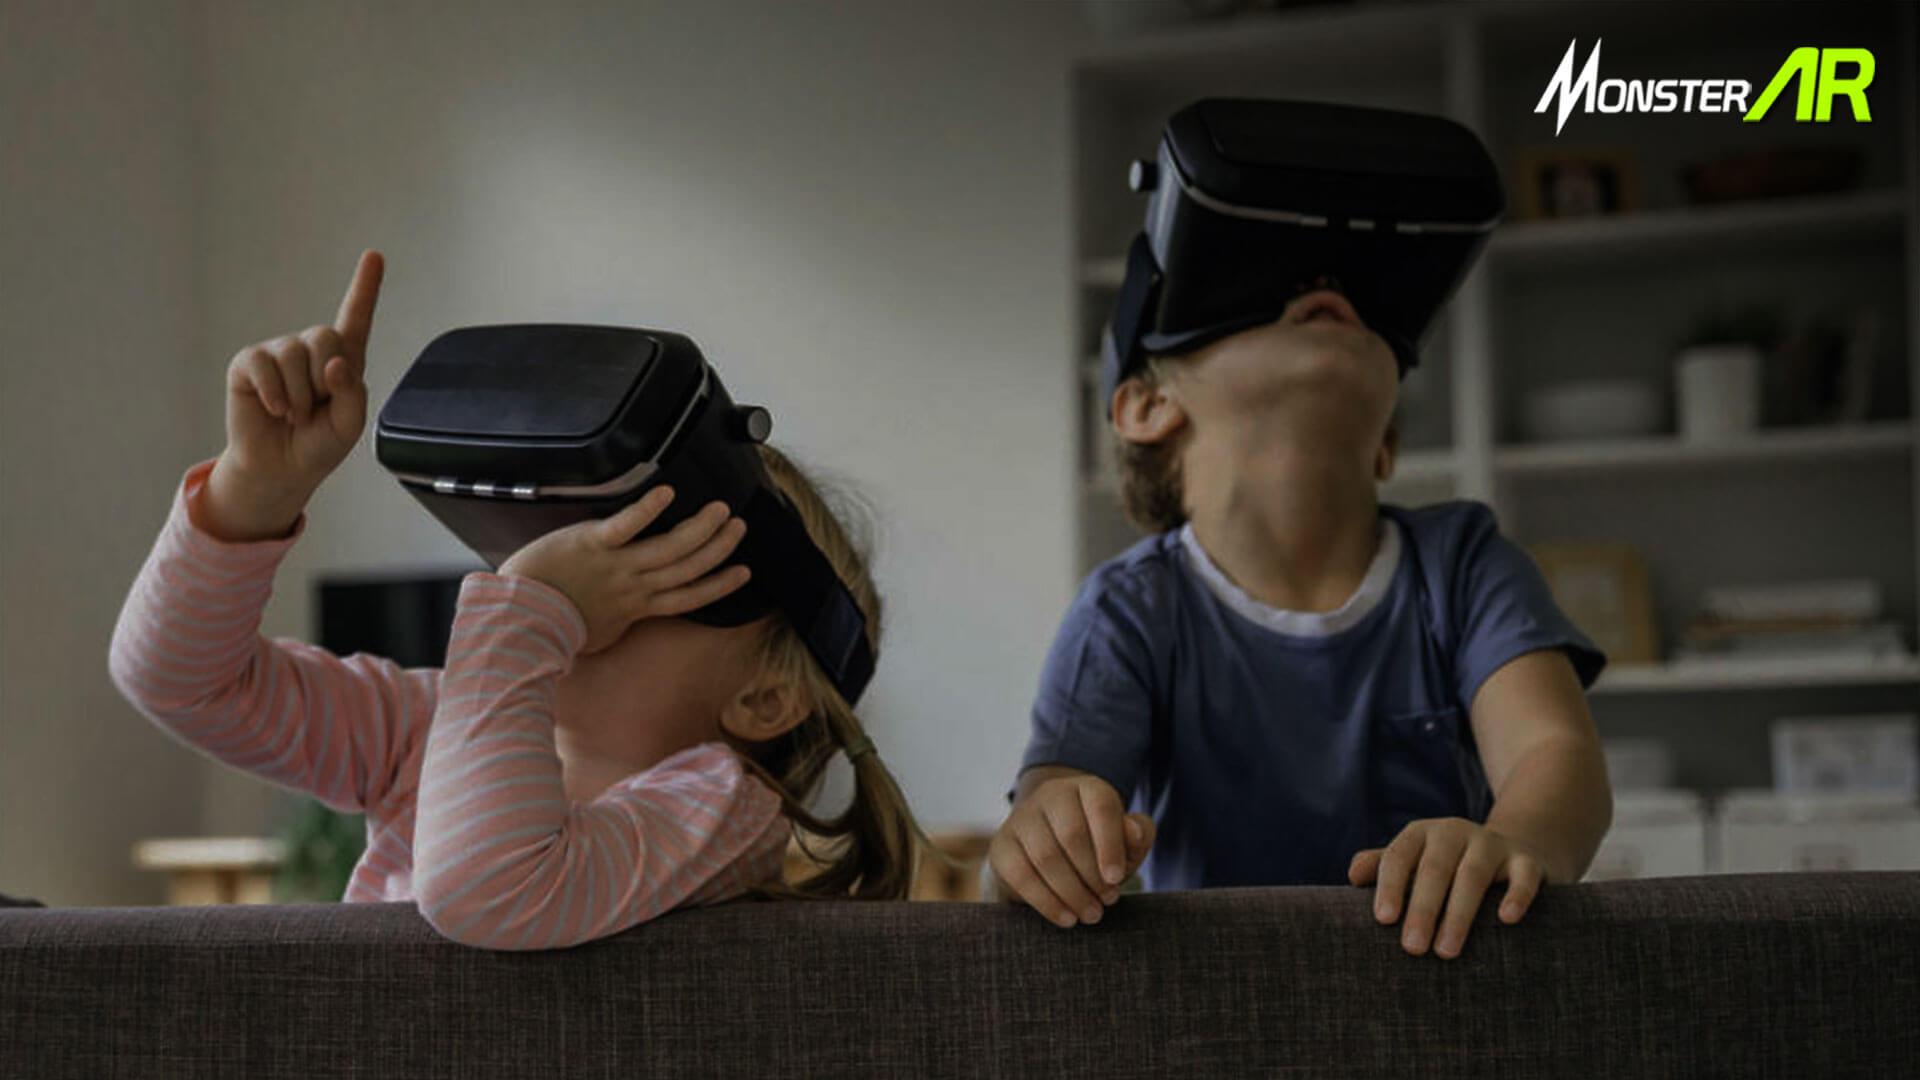 Terapi ADHD Menggunakan VR